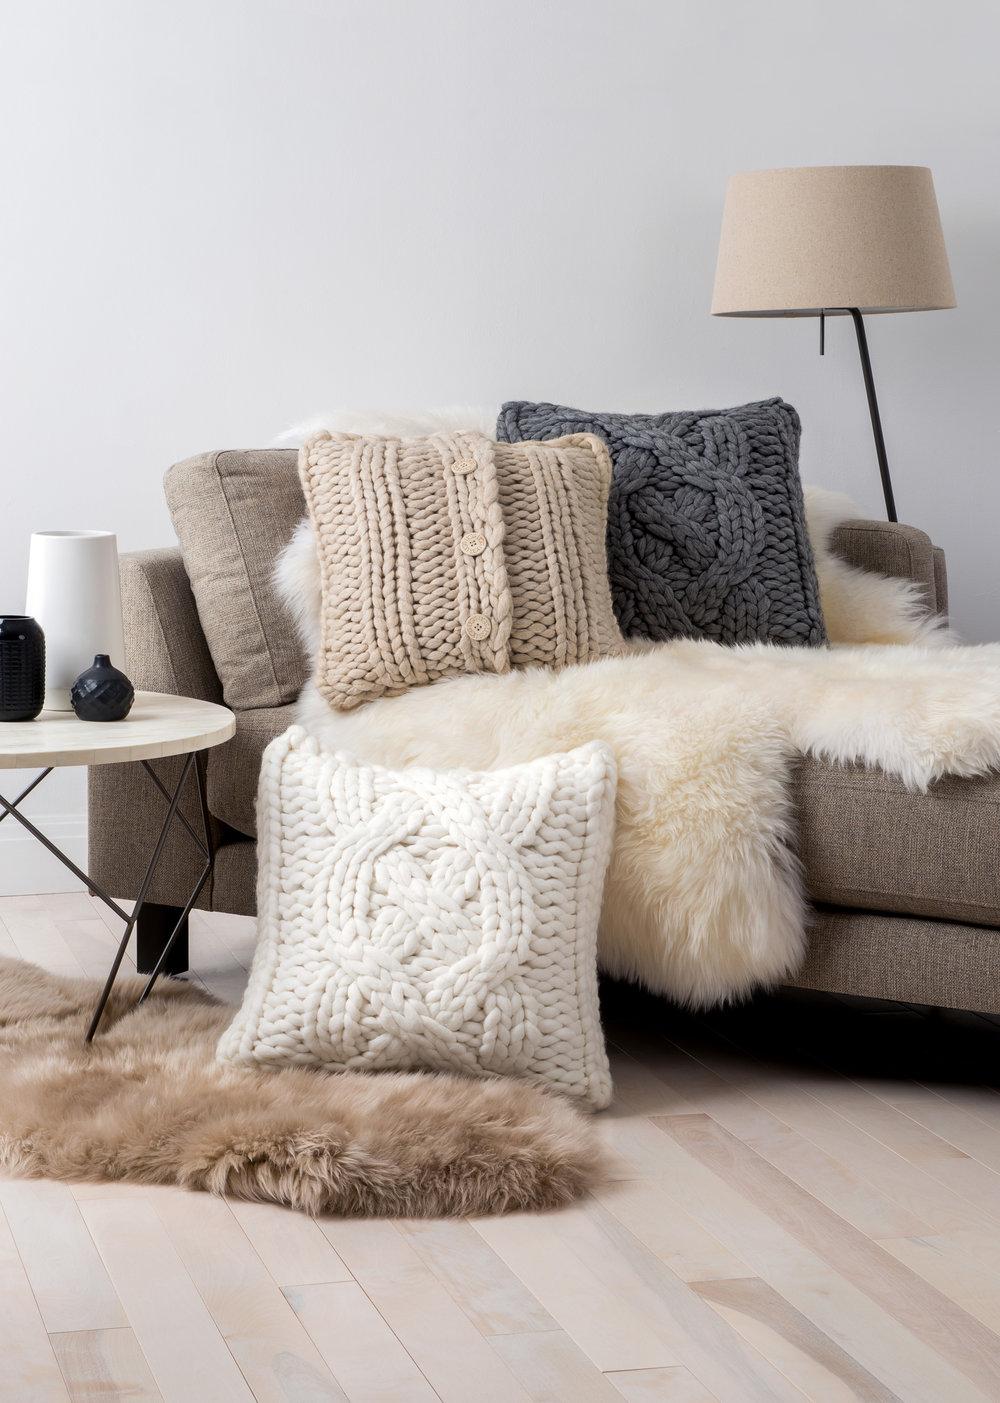 LS_pillows_ov_knit.JPG